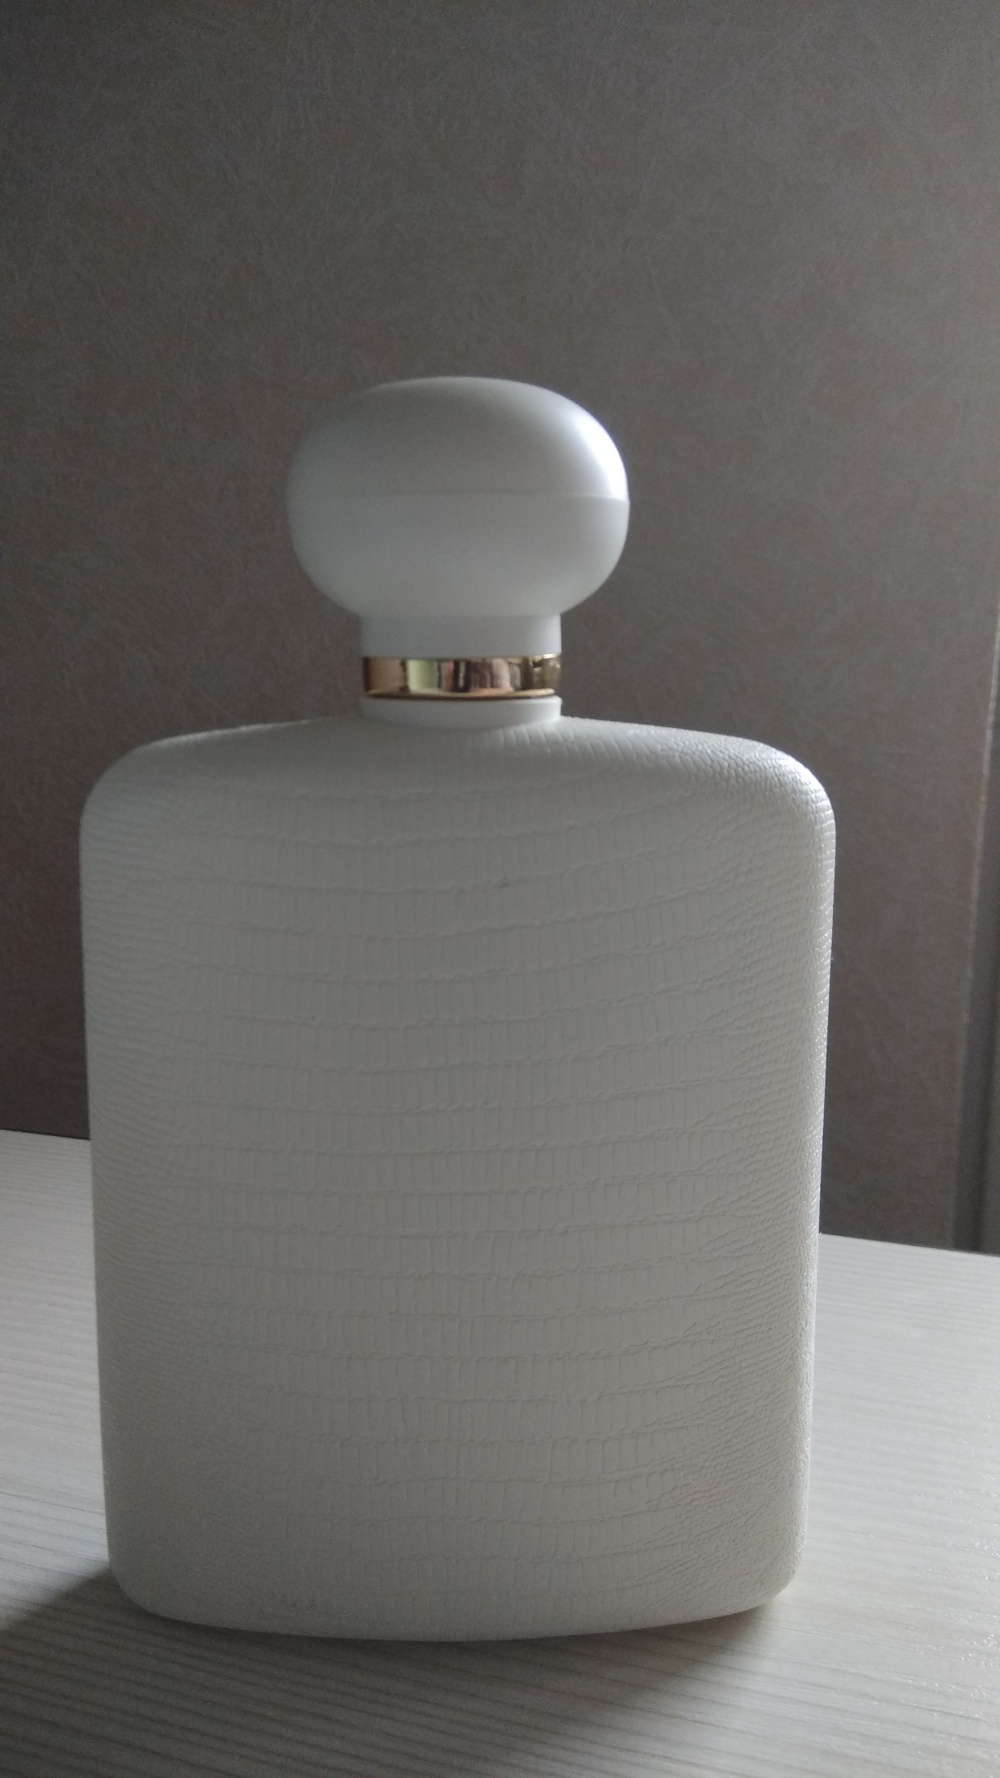 Trussardi, туалетная вода Trussardi, 90/100 мл